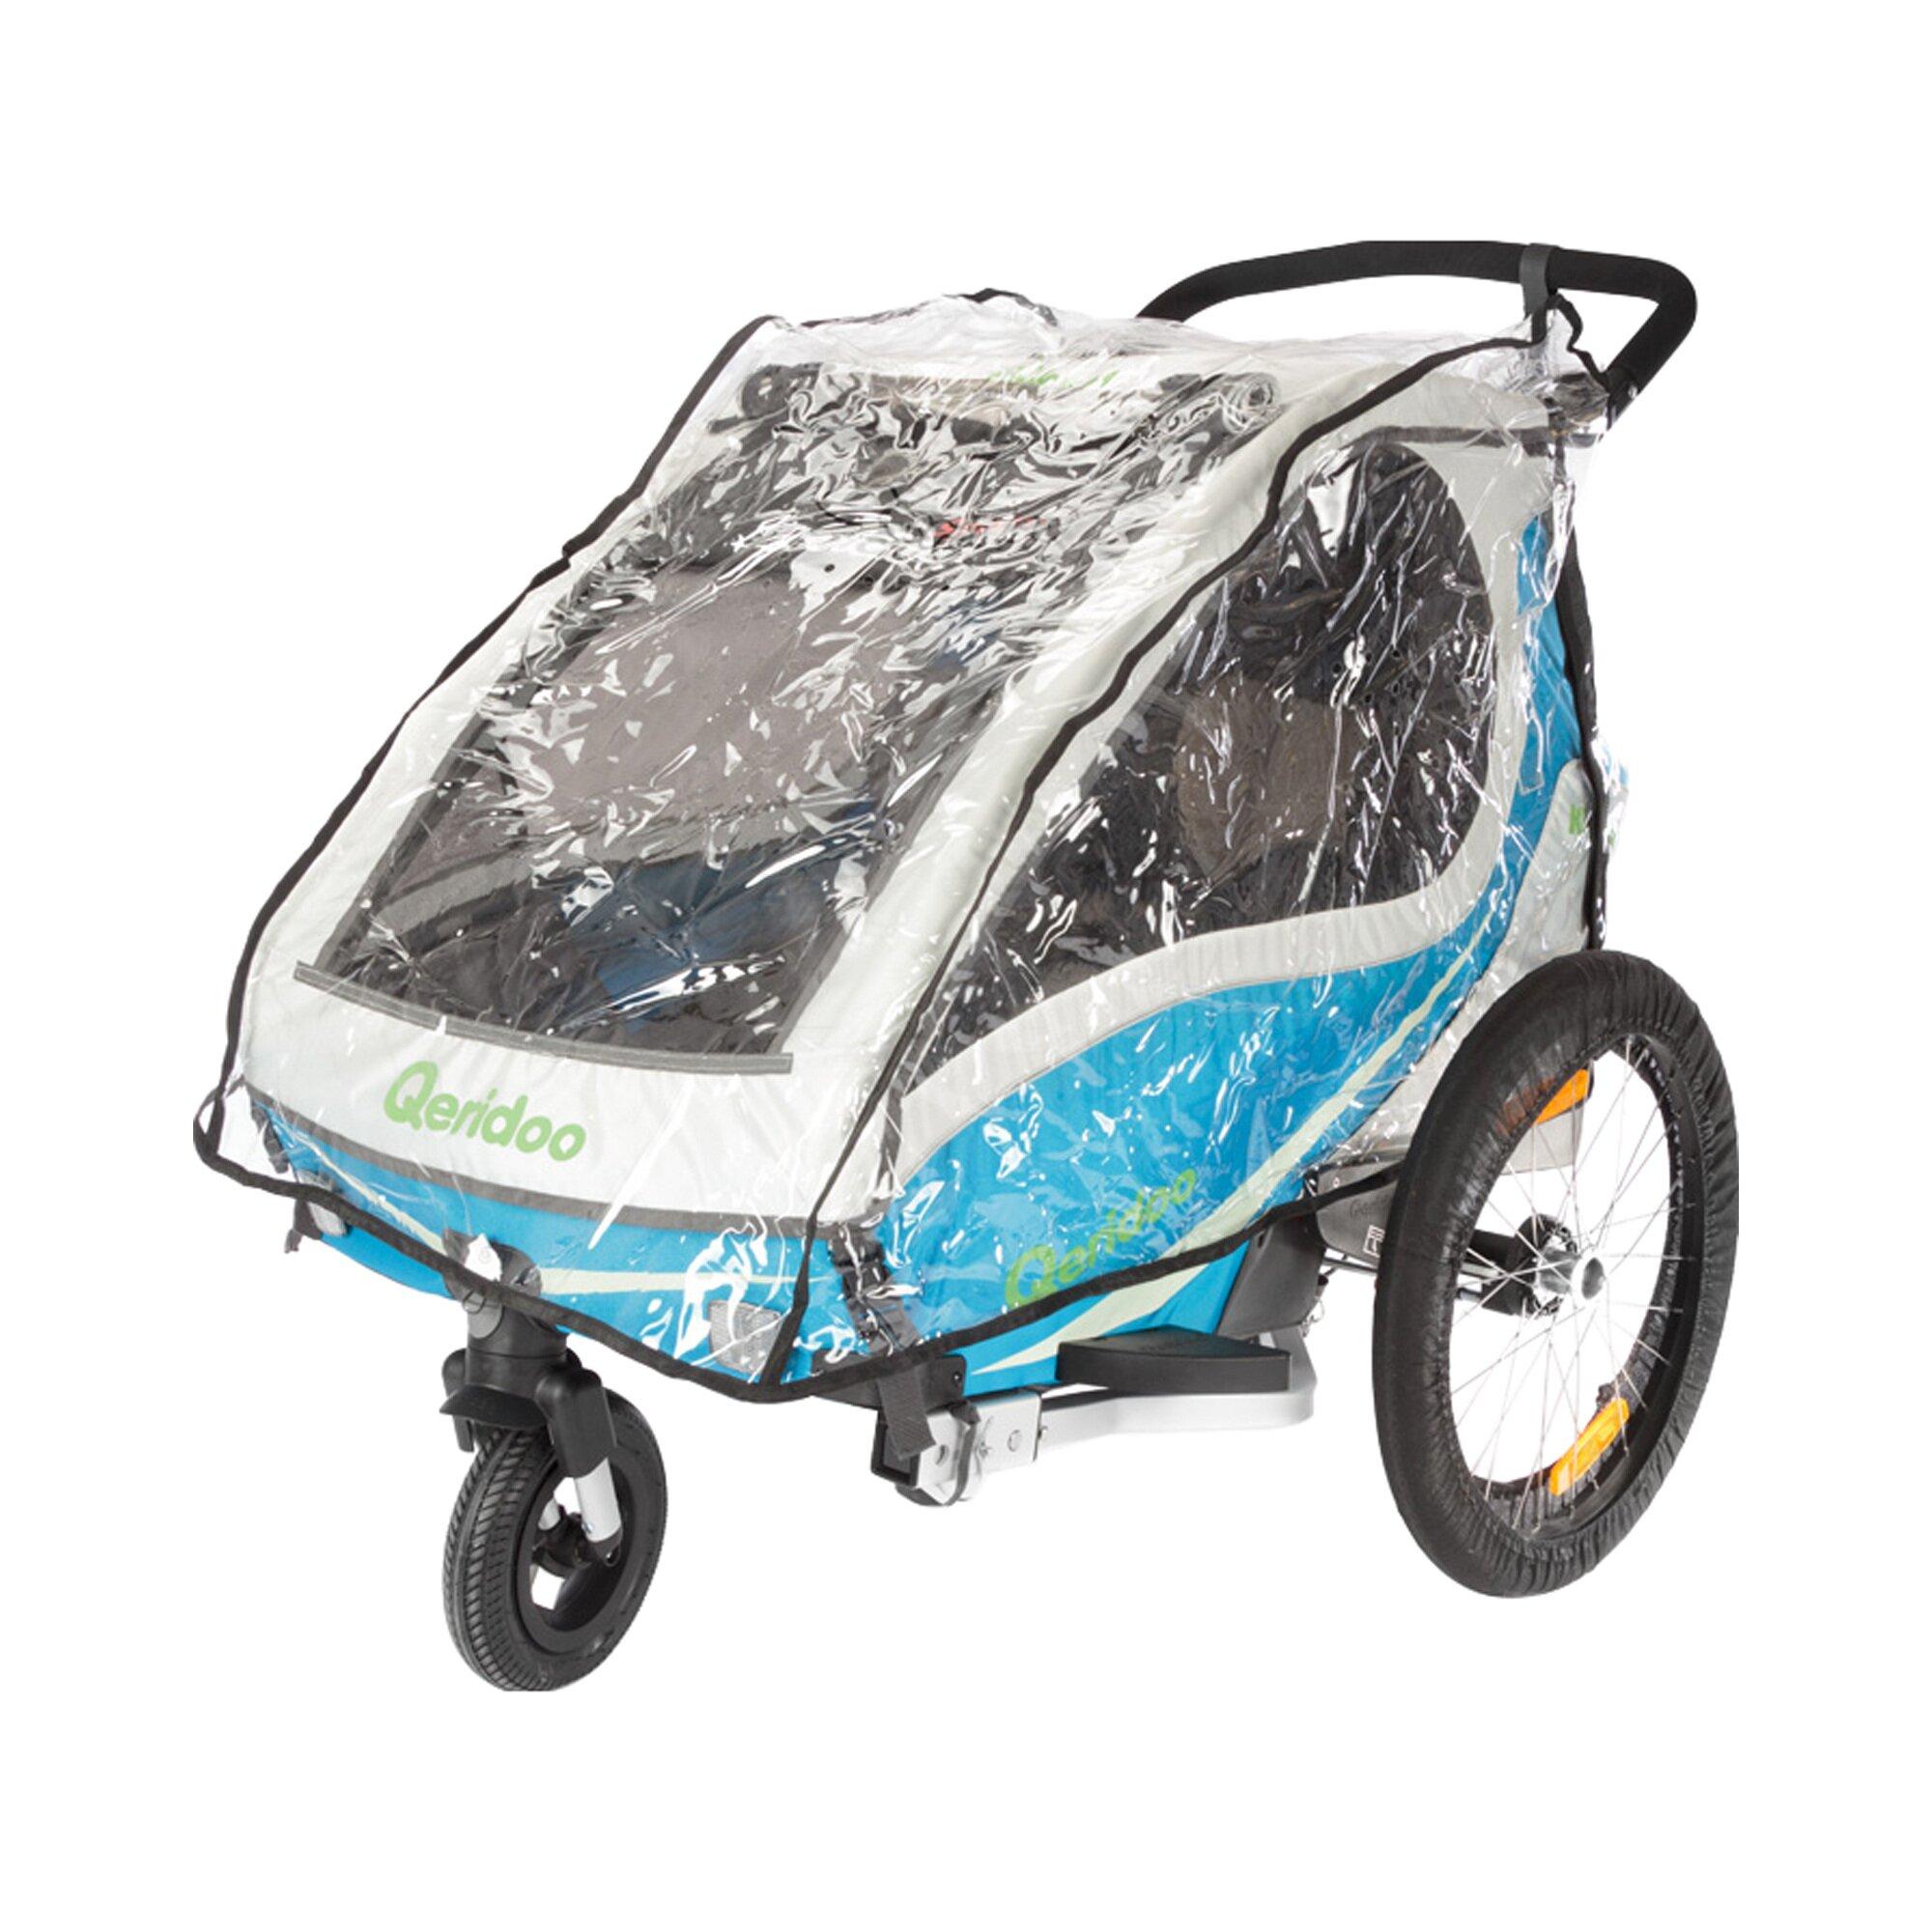 Qeridoo Regenschutz für Kinderfahrradanhänger Kidgoo2 und Kidgoo2 Sport